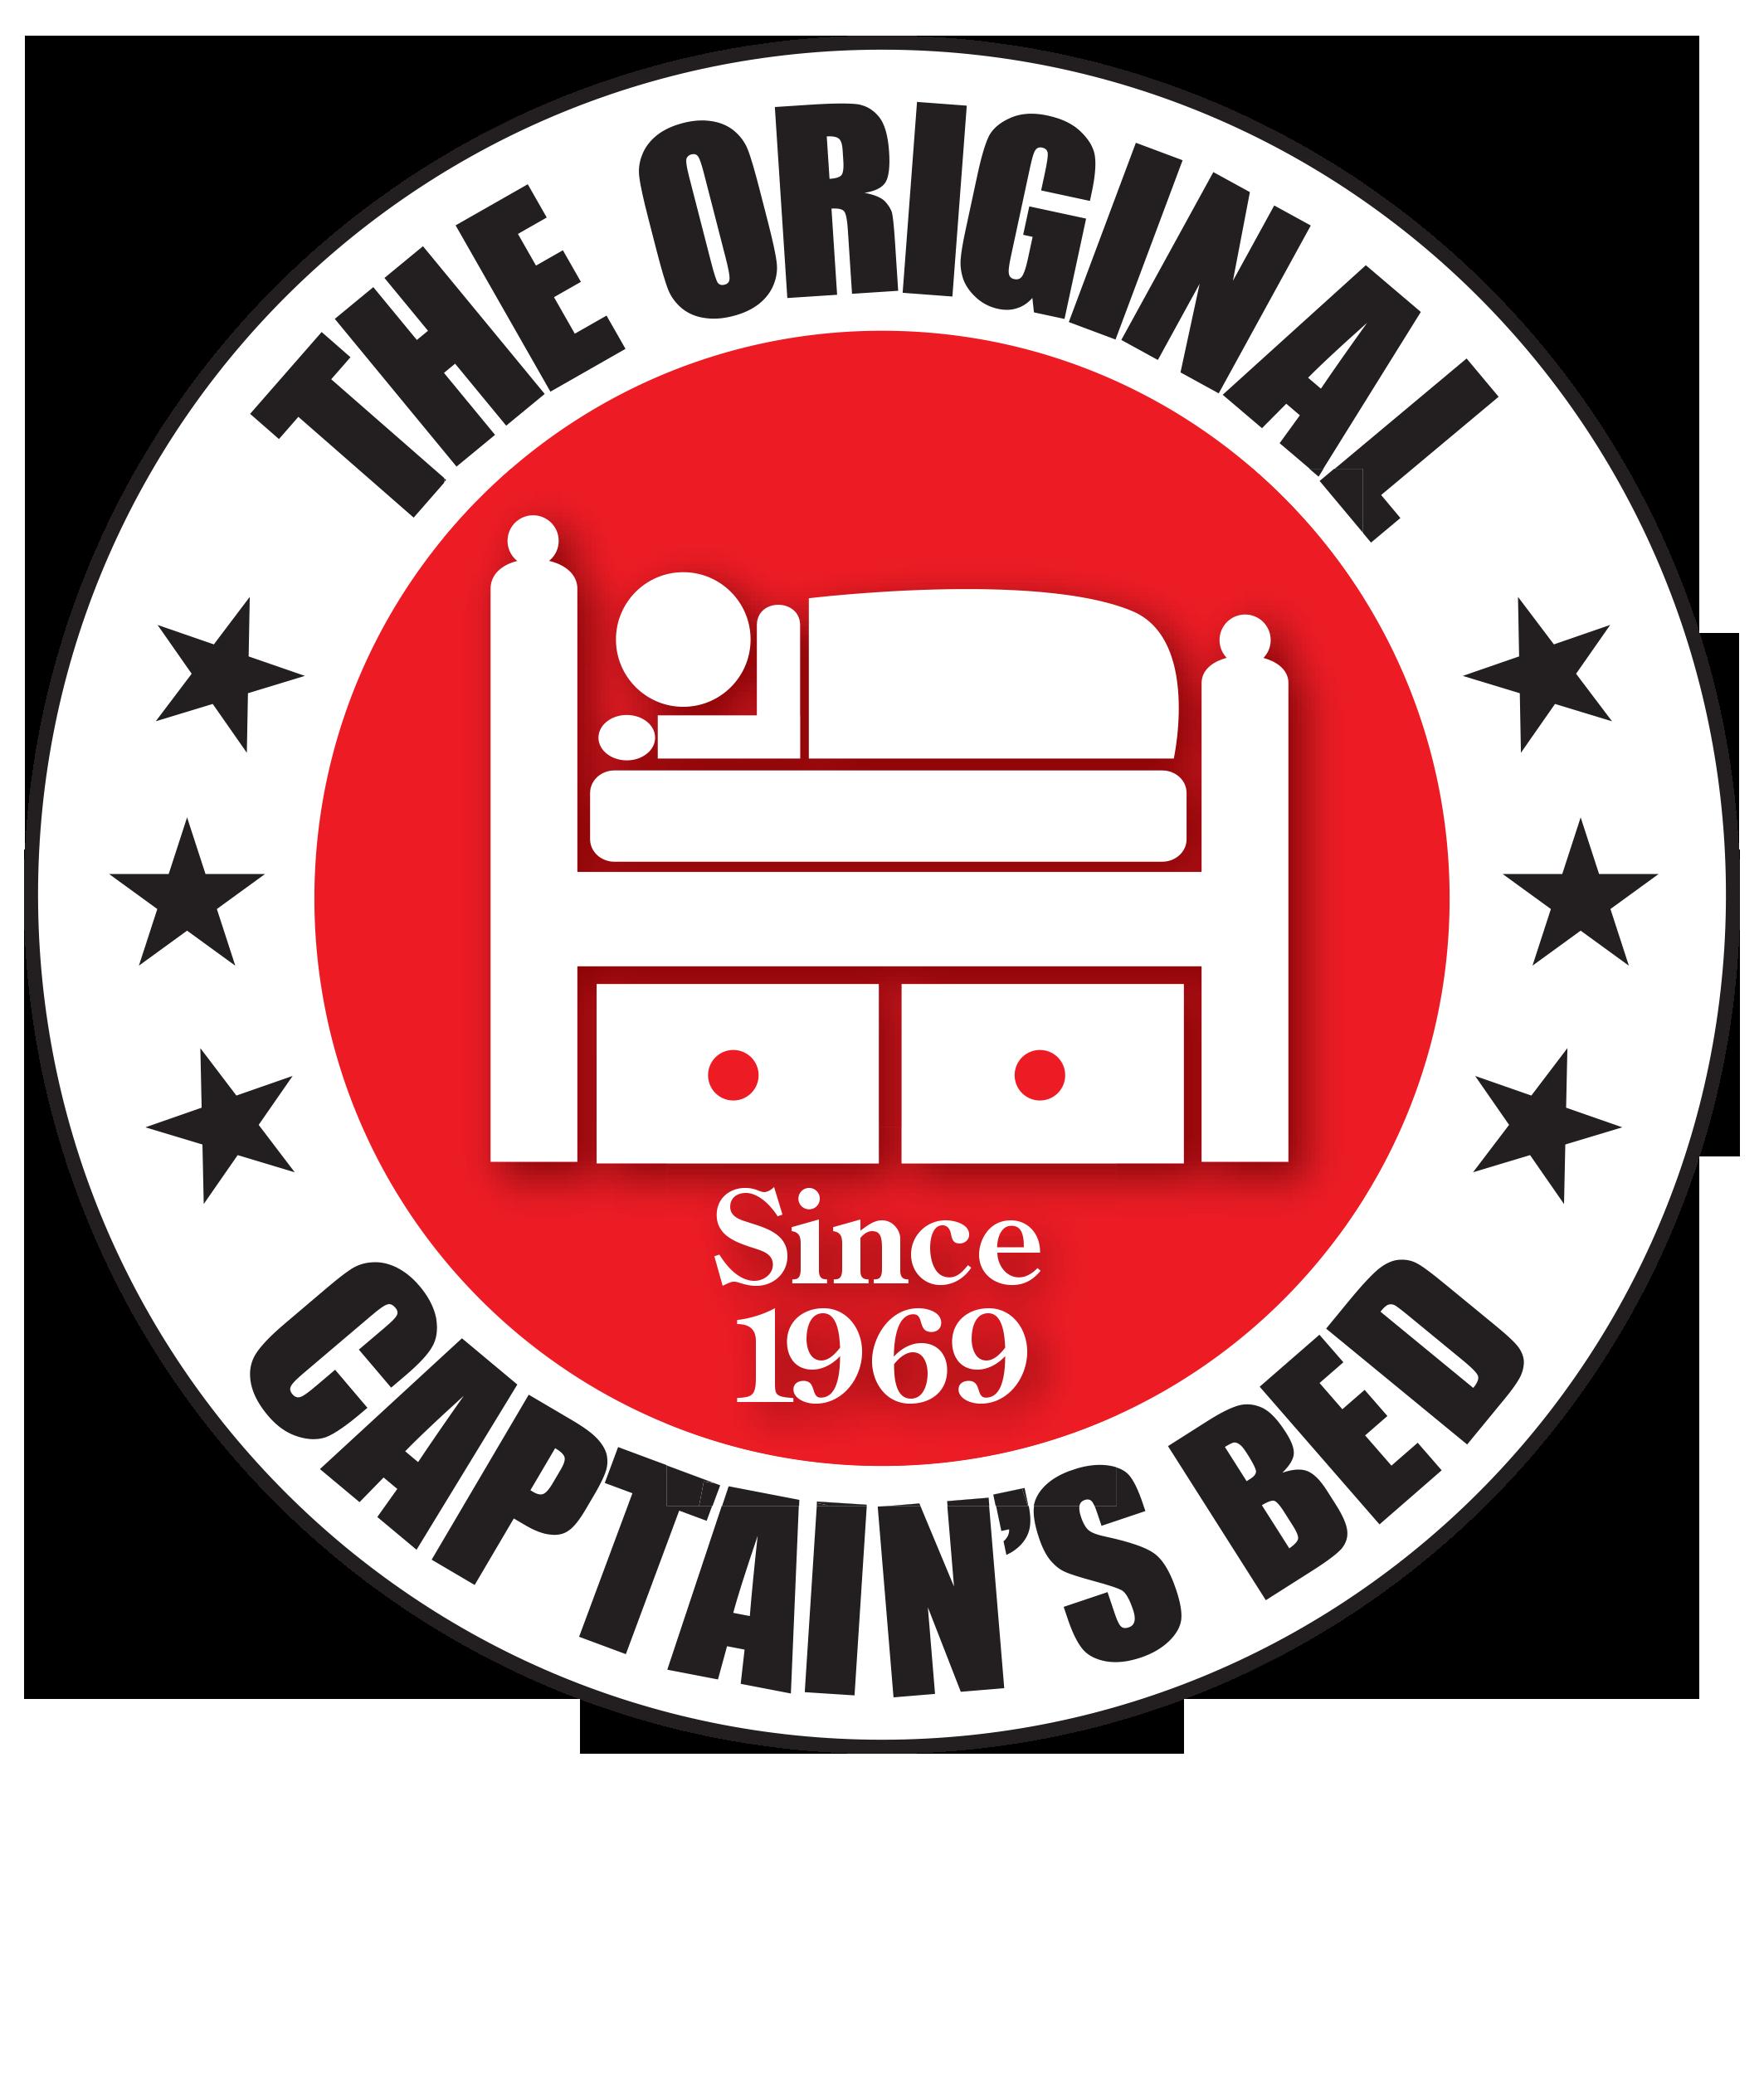 The Original Captains Bed™